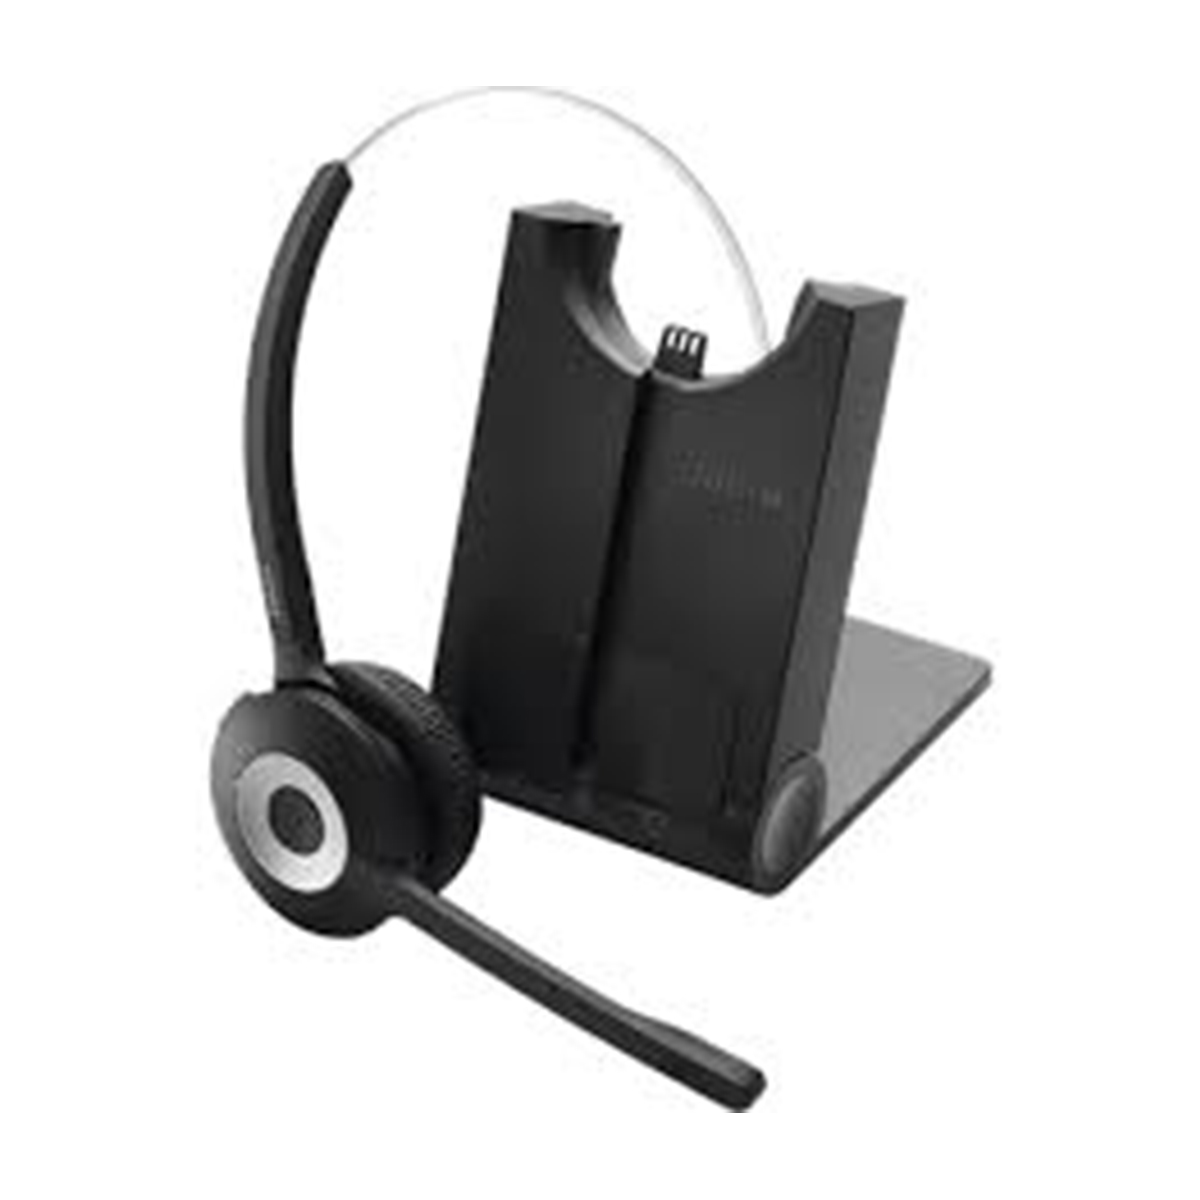 Jabra Pro 930 UC Mono Headset